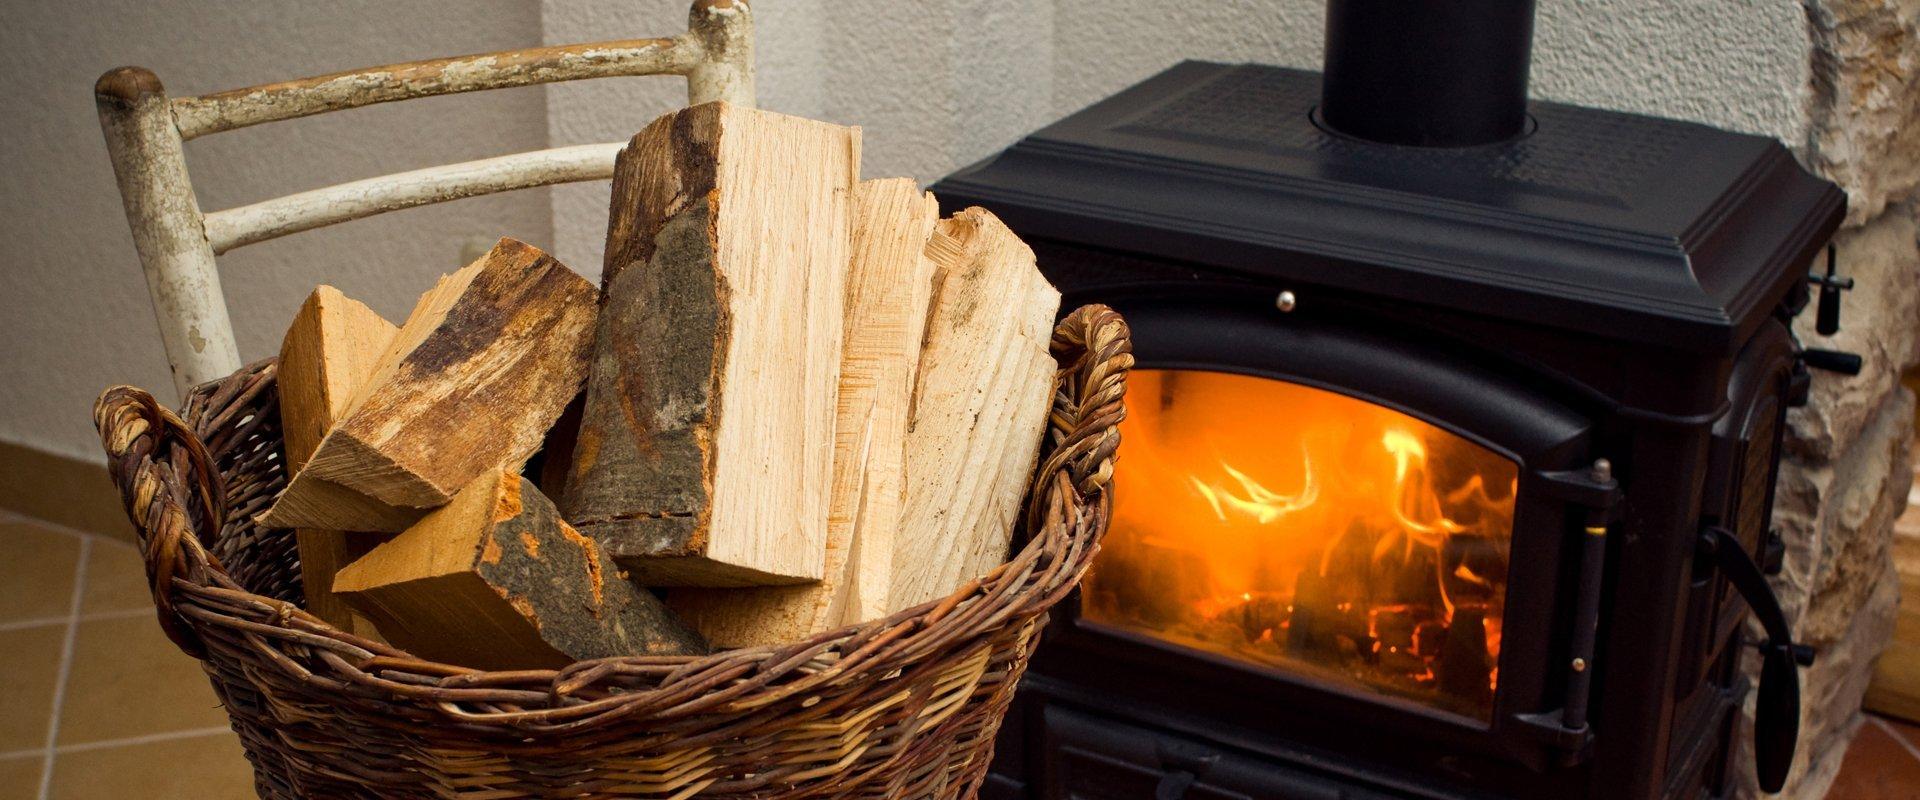 Fuel and chimney design